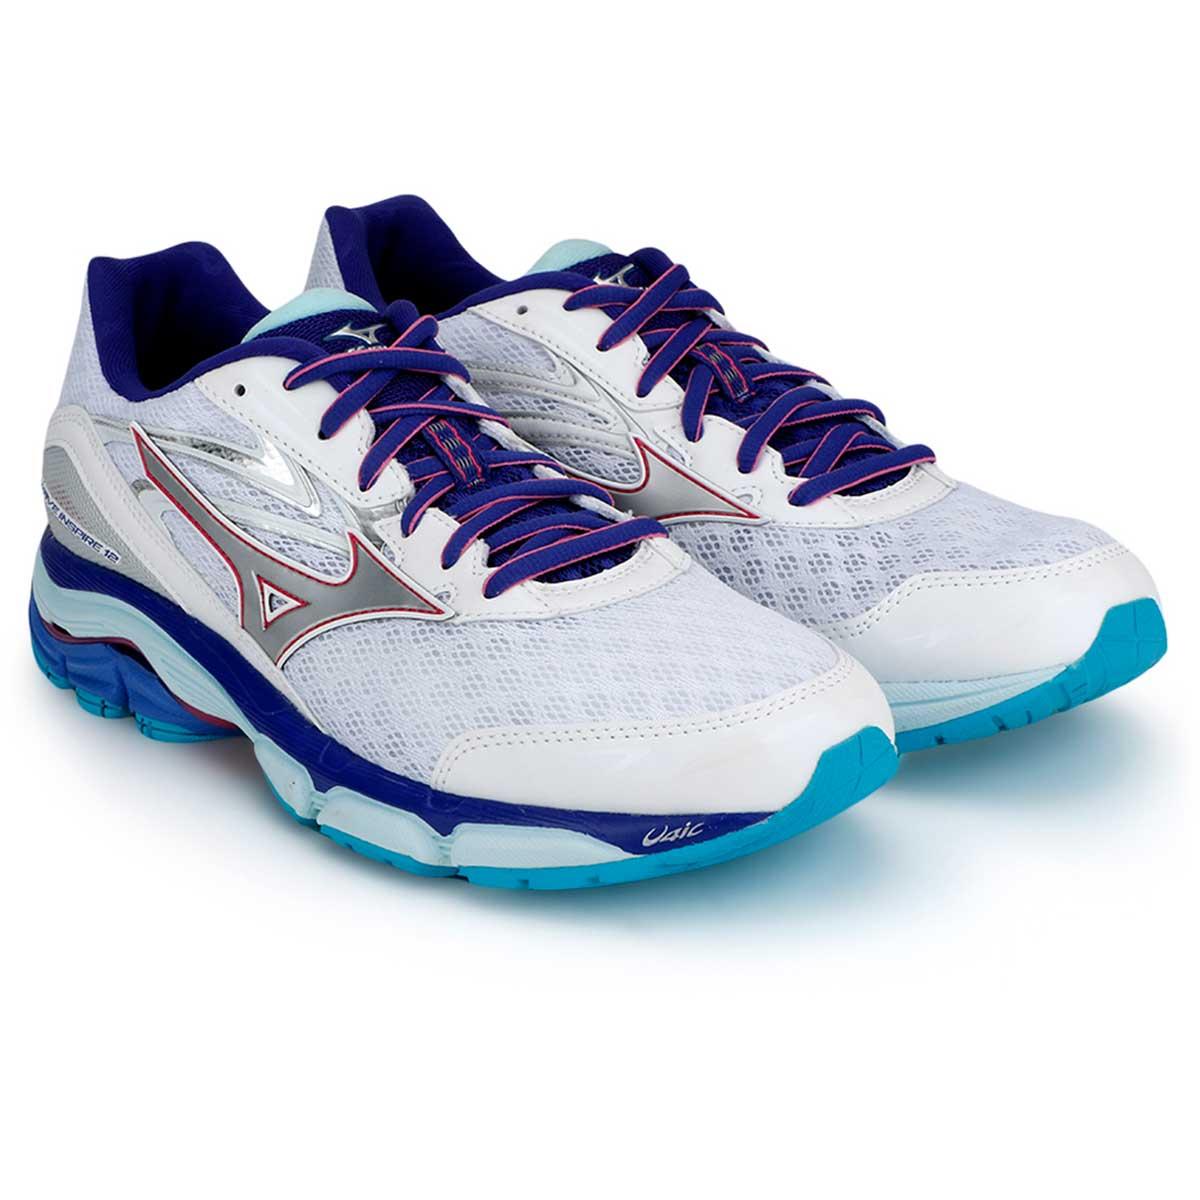 new style def75 5865f Buy Mizuno Wave Inspire 12 Women Running Shoes Online India